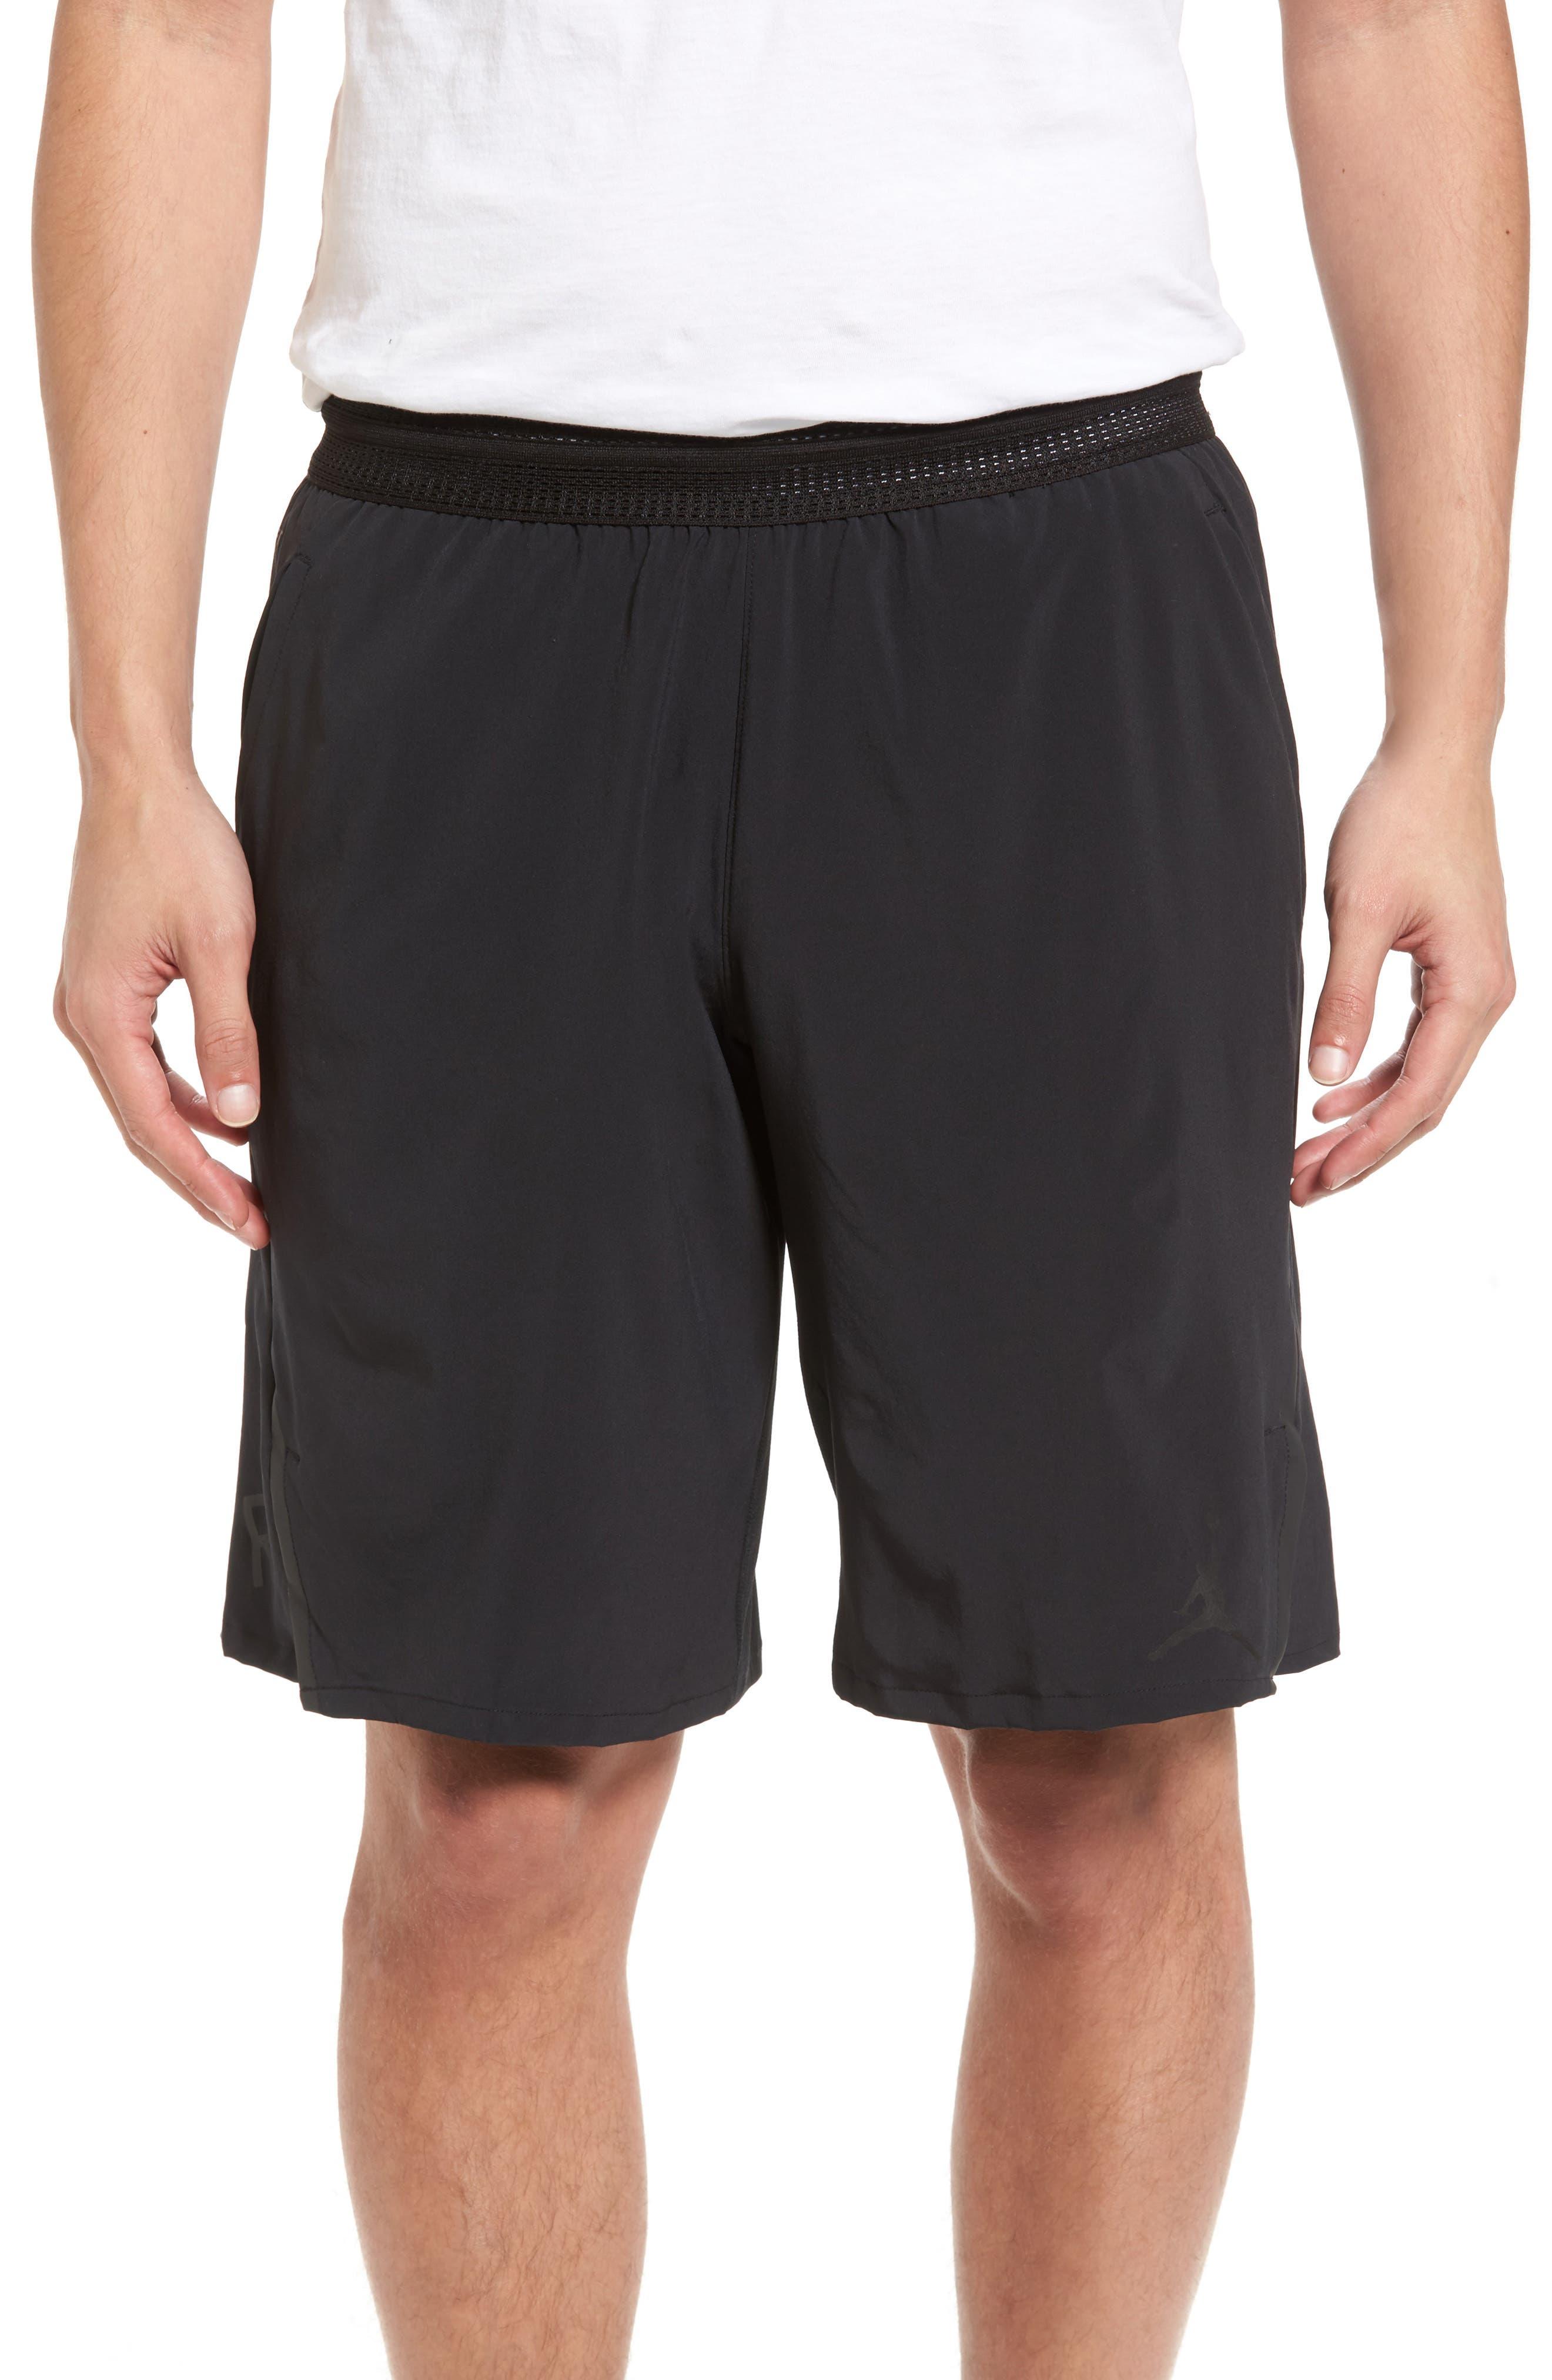 Nike Ultimate Flight Basketball Shorts,                         Main,                         color, Black/ Black